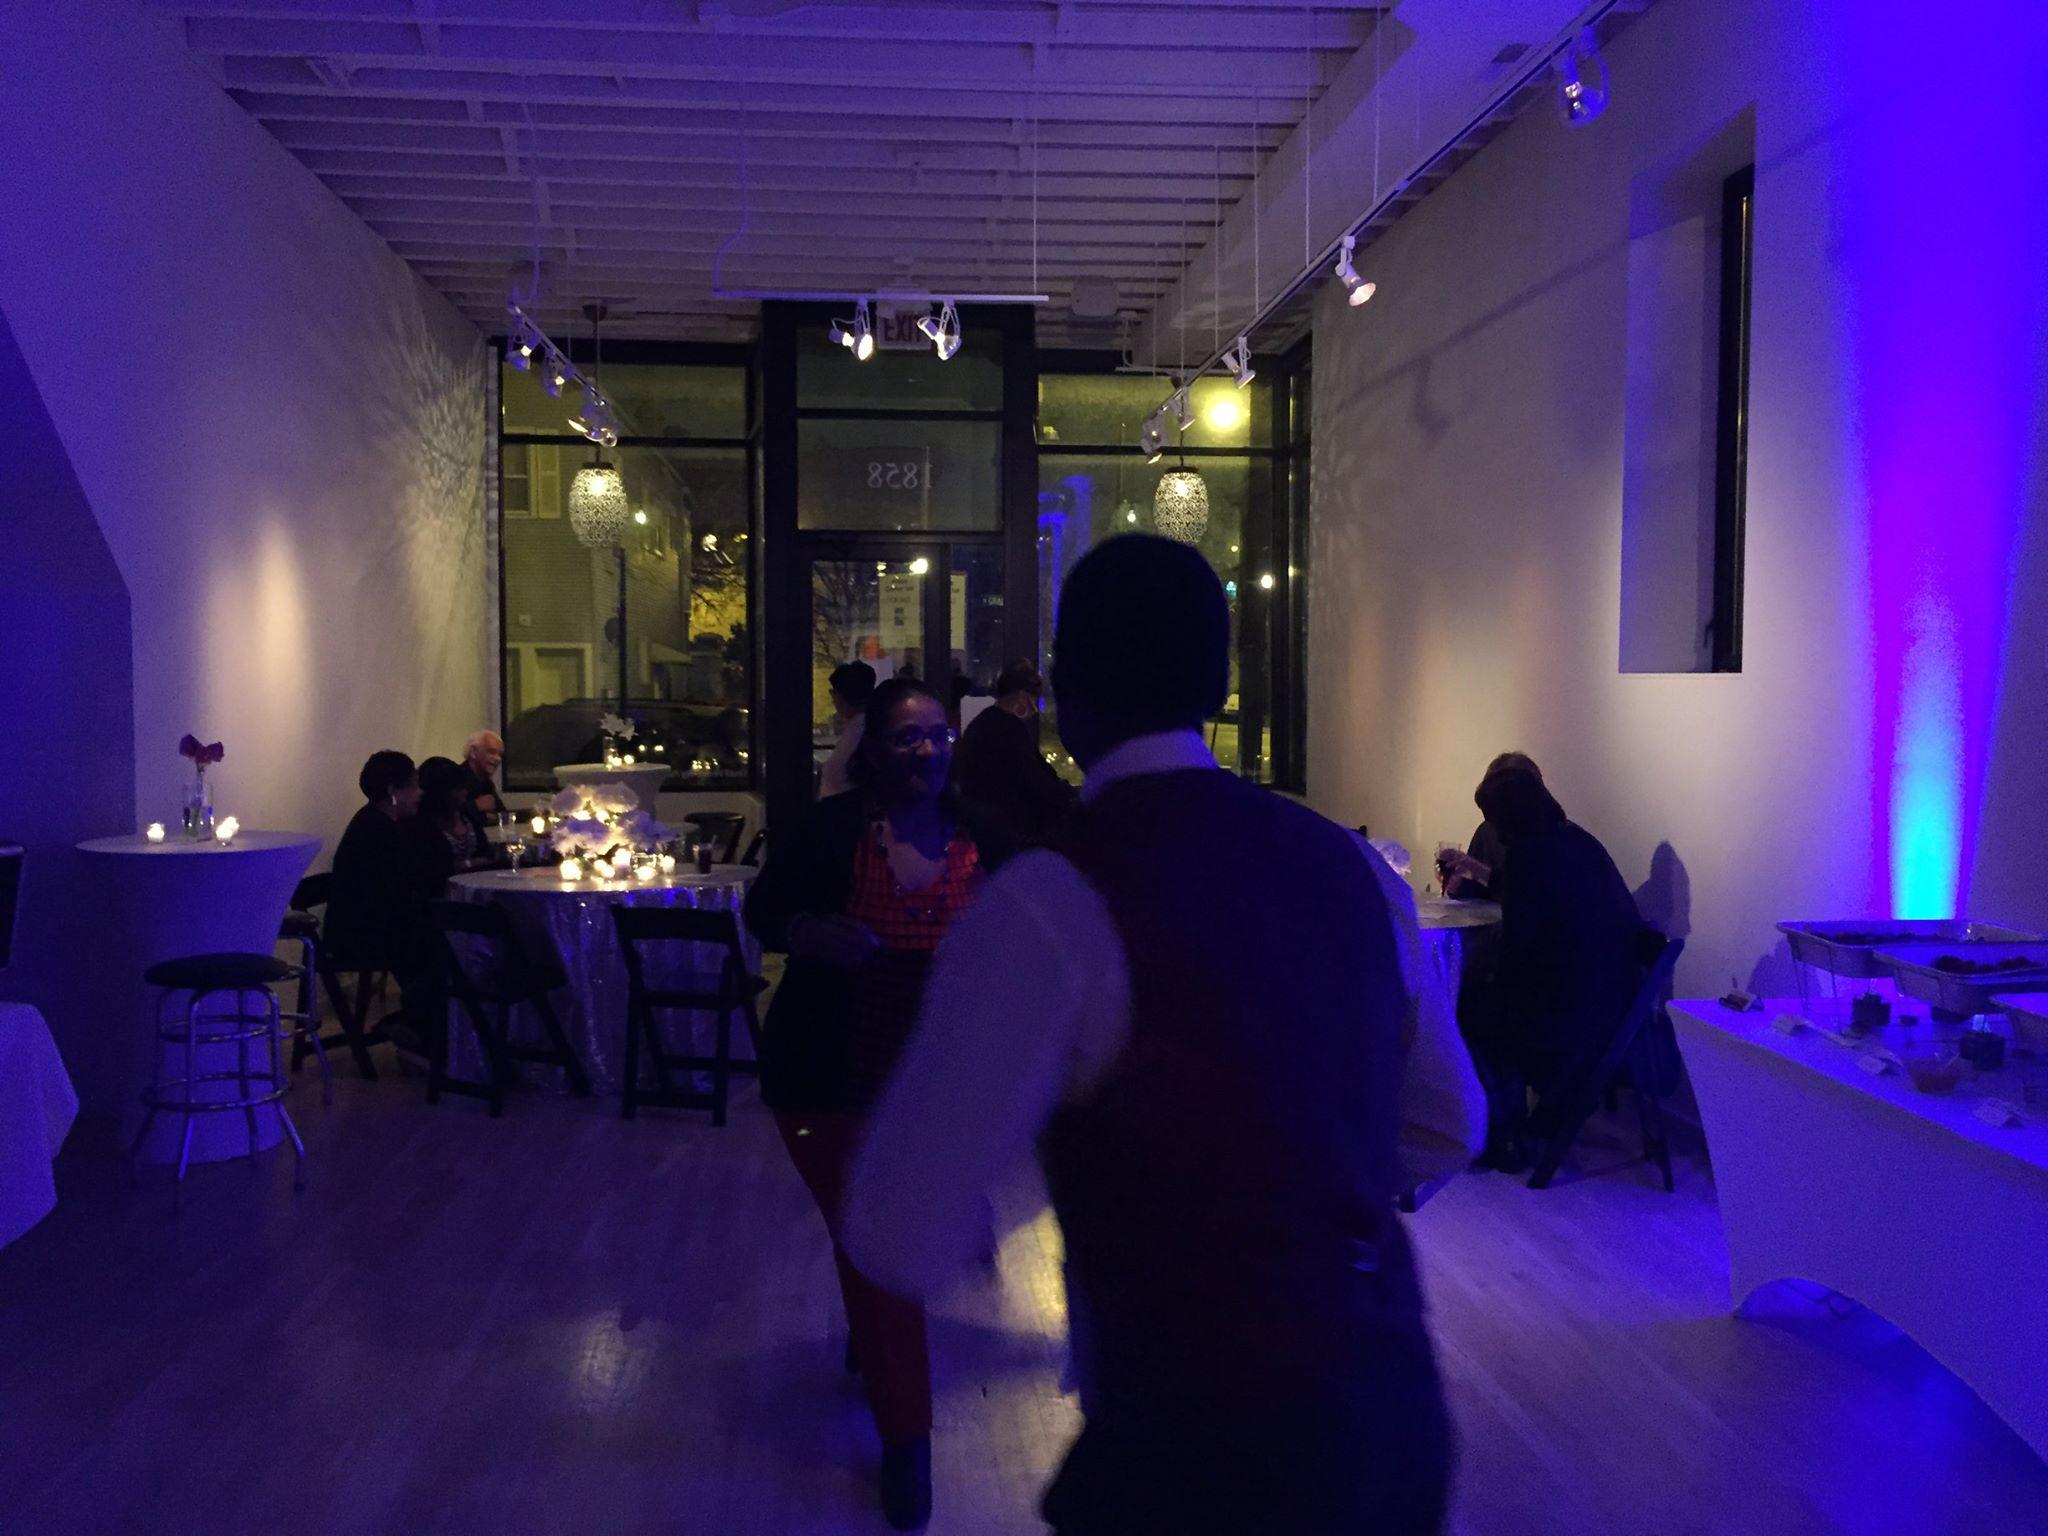 gallery event 11 blue.jpg